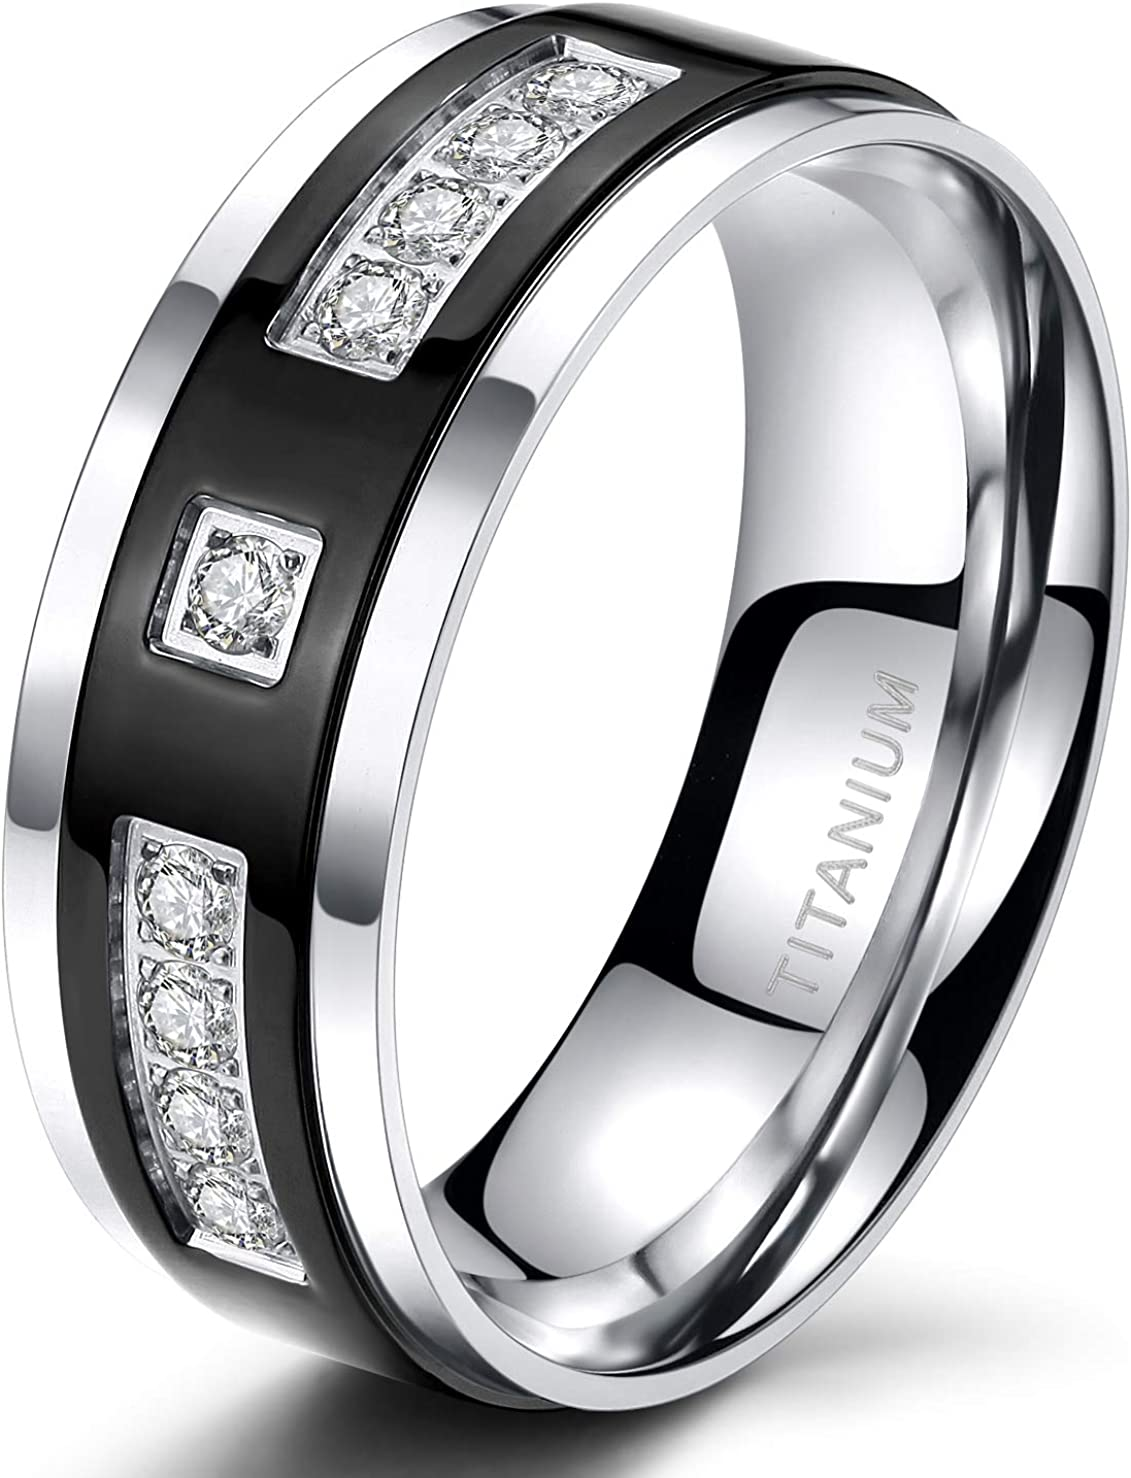 TIGRADE 6mm 8mm Black Titanium Eternity Ring Cubic Zirconia Wedding Band for Men Women